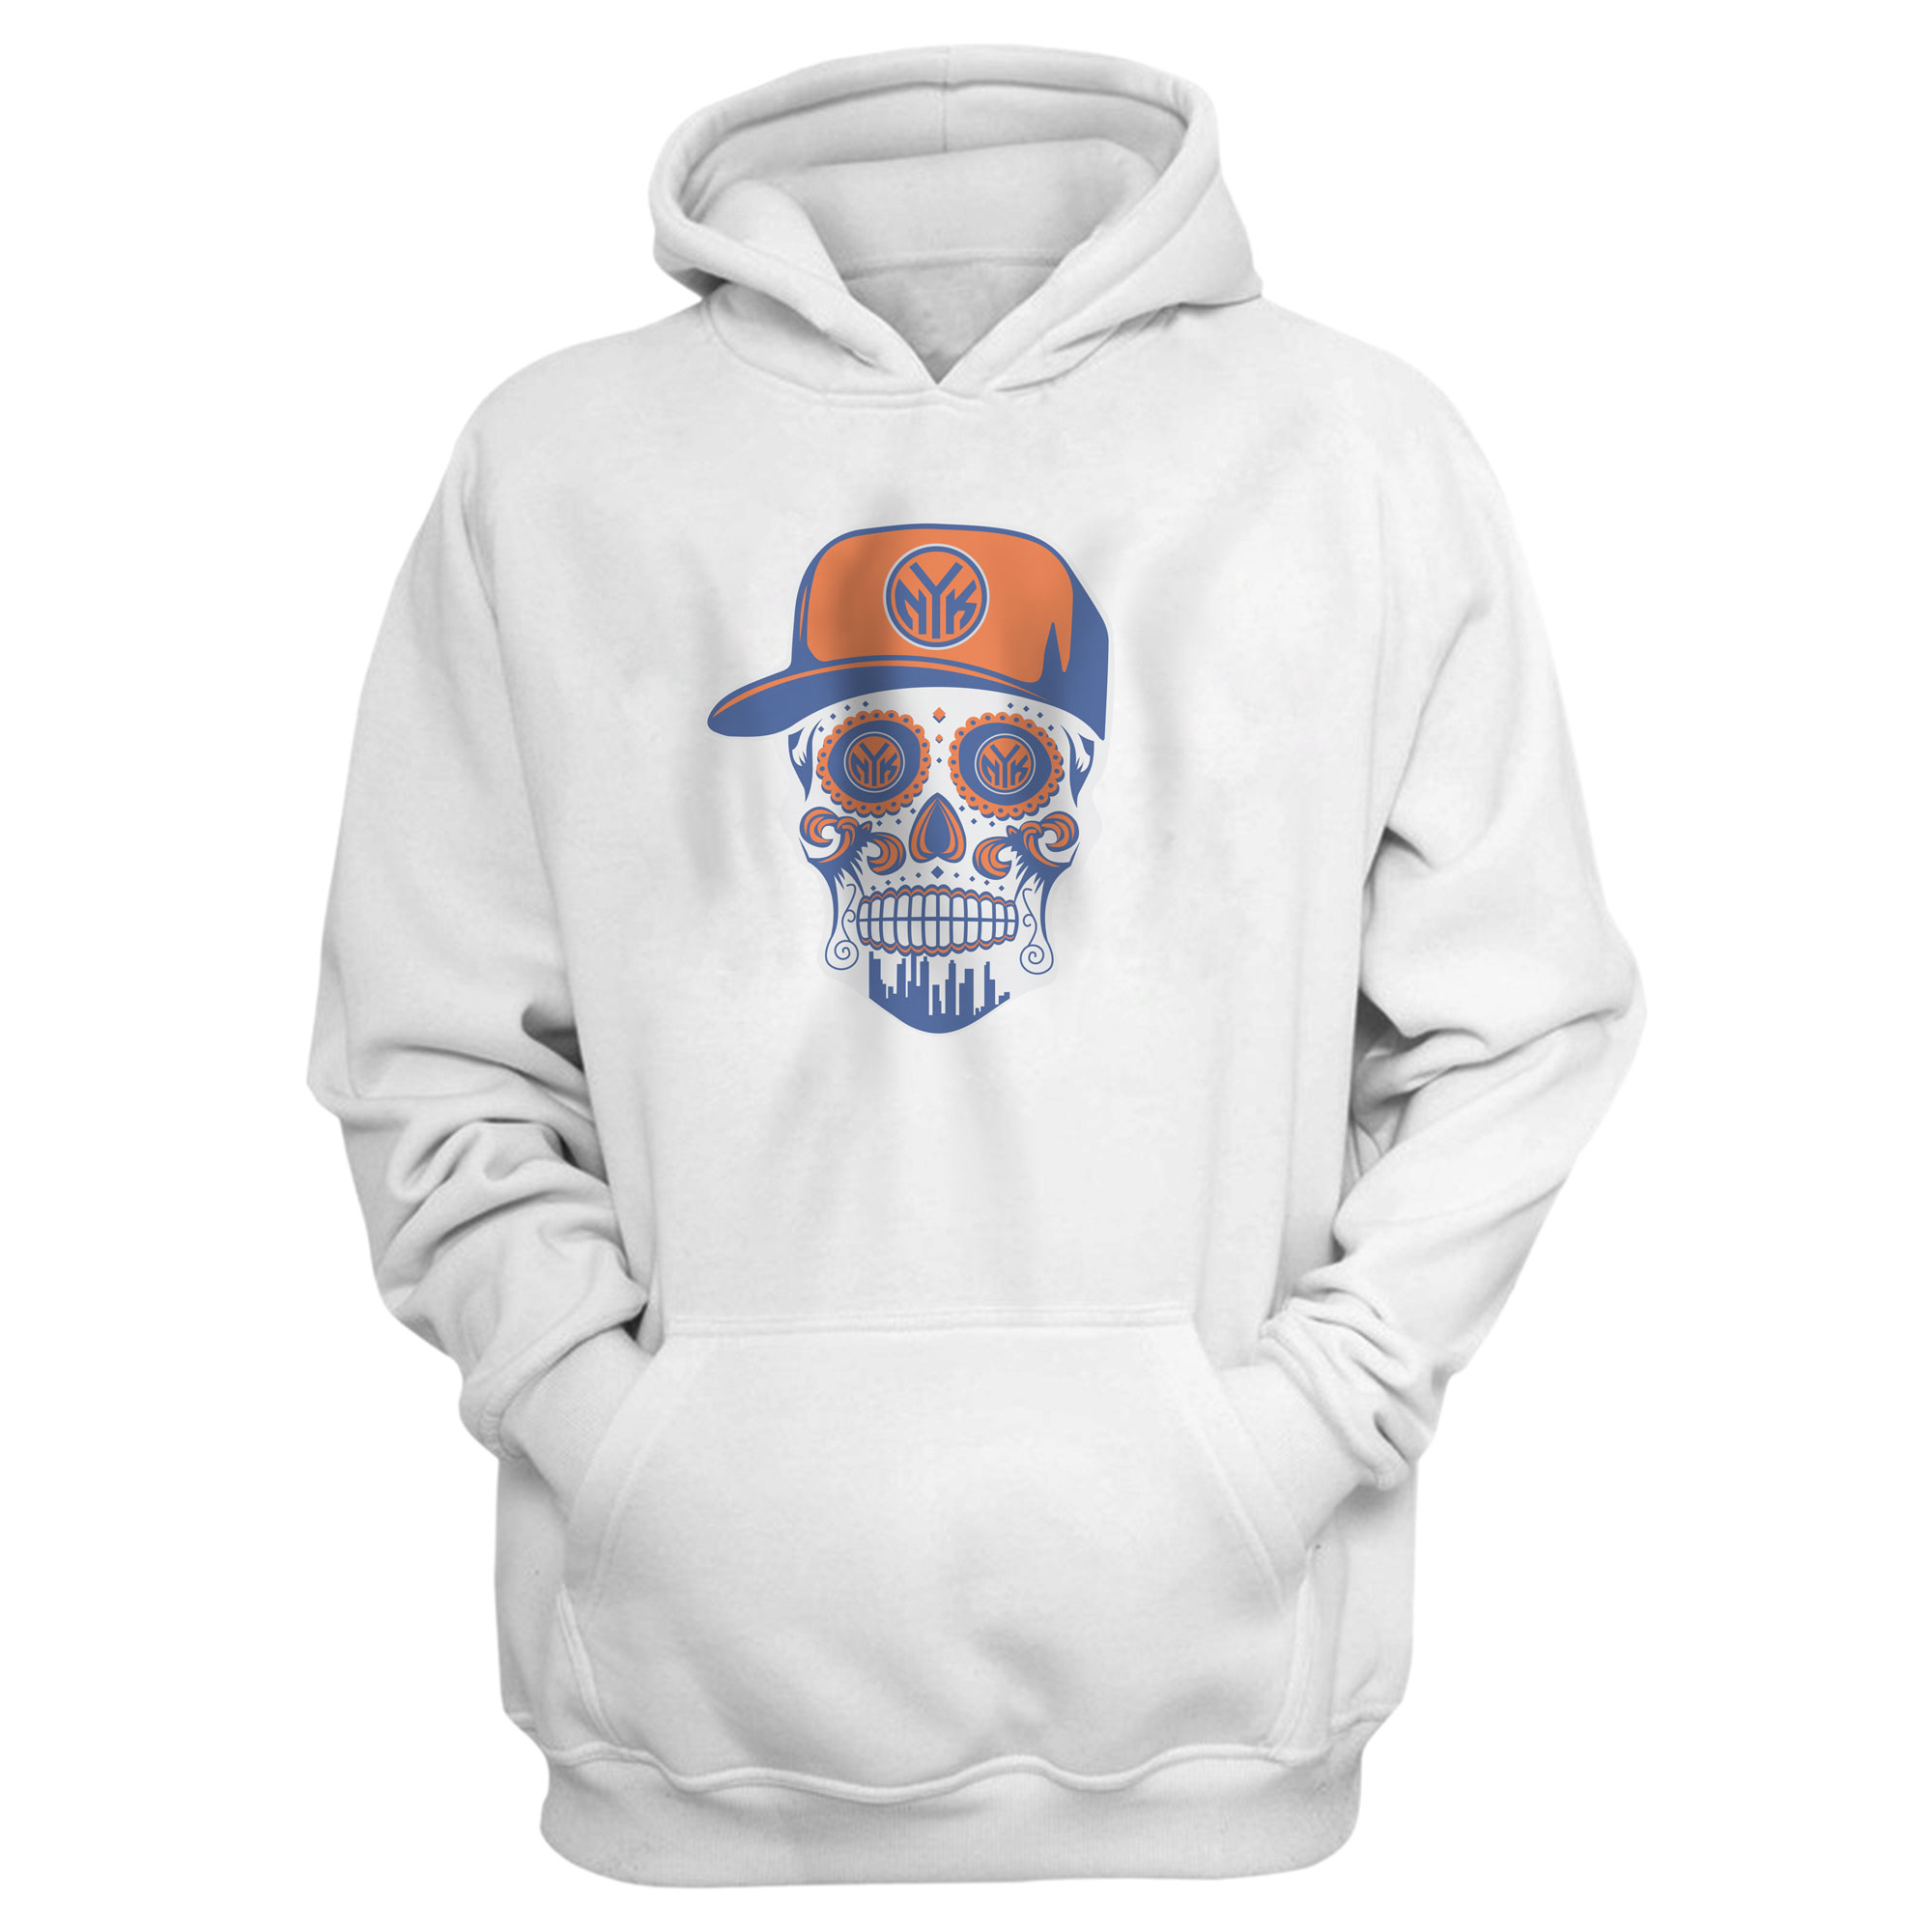 Knicks Skull Hoodie (HD-WHT-NP-NBA-458-NYK-SKULL)